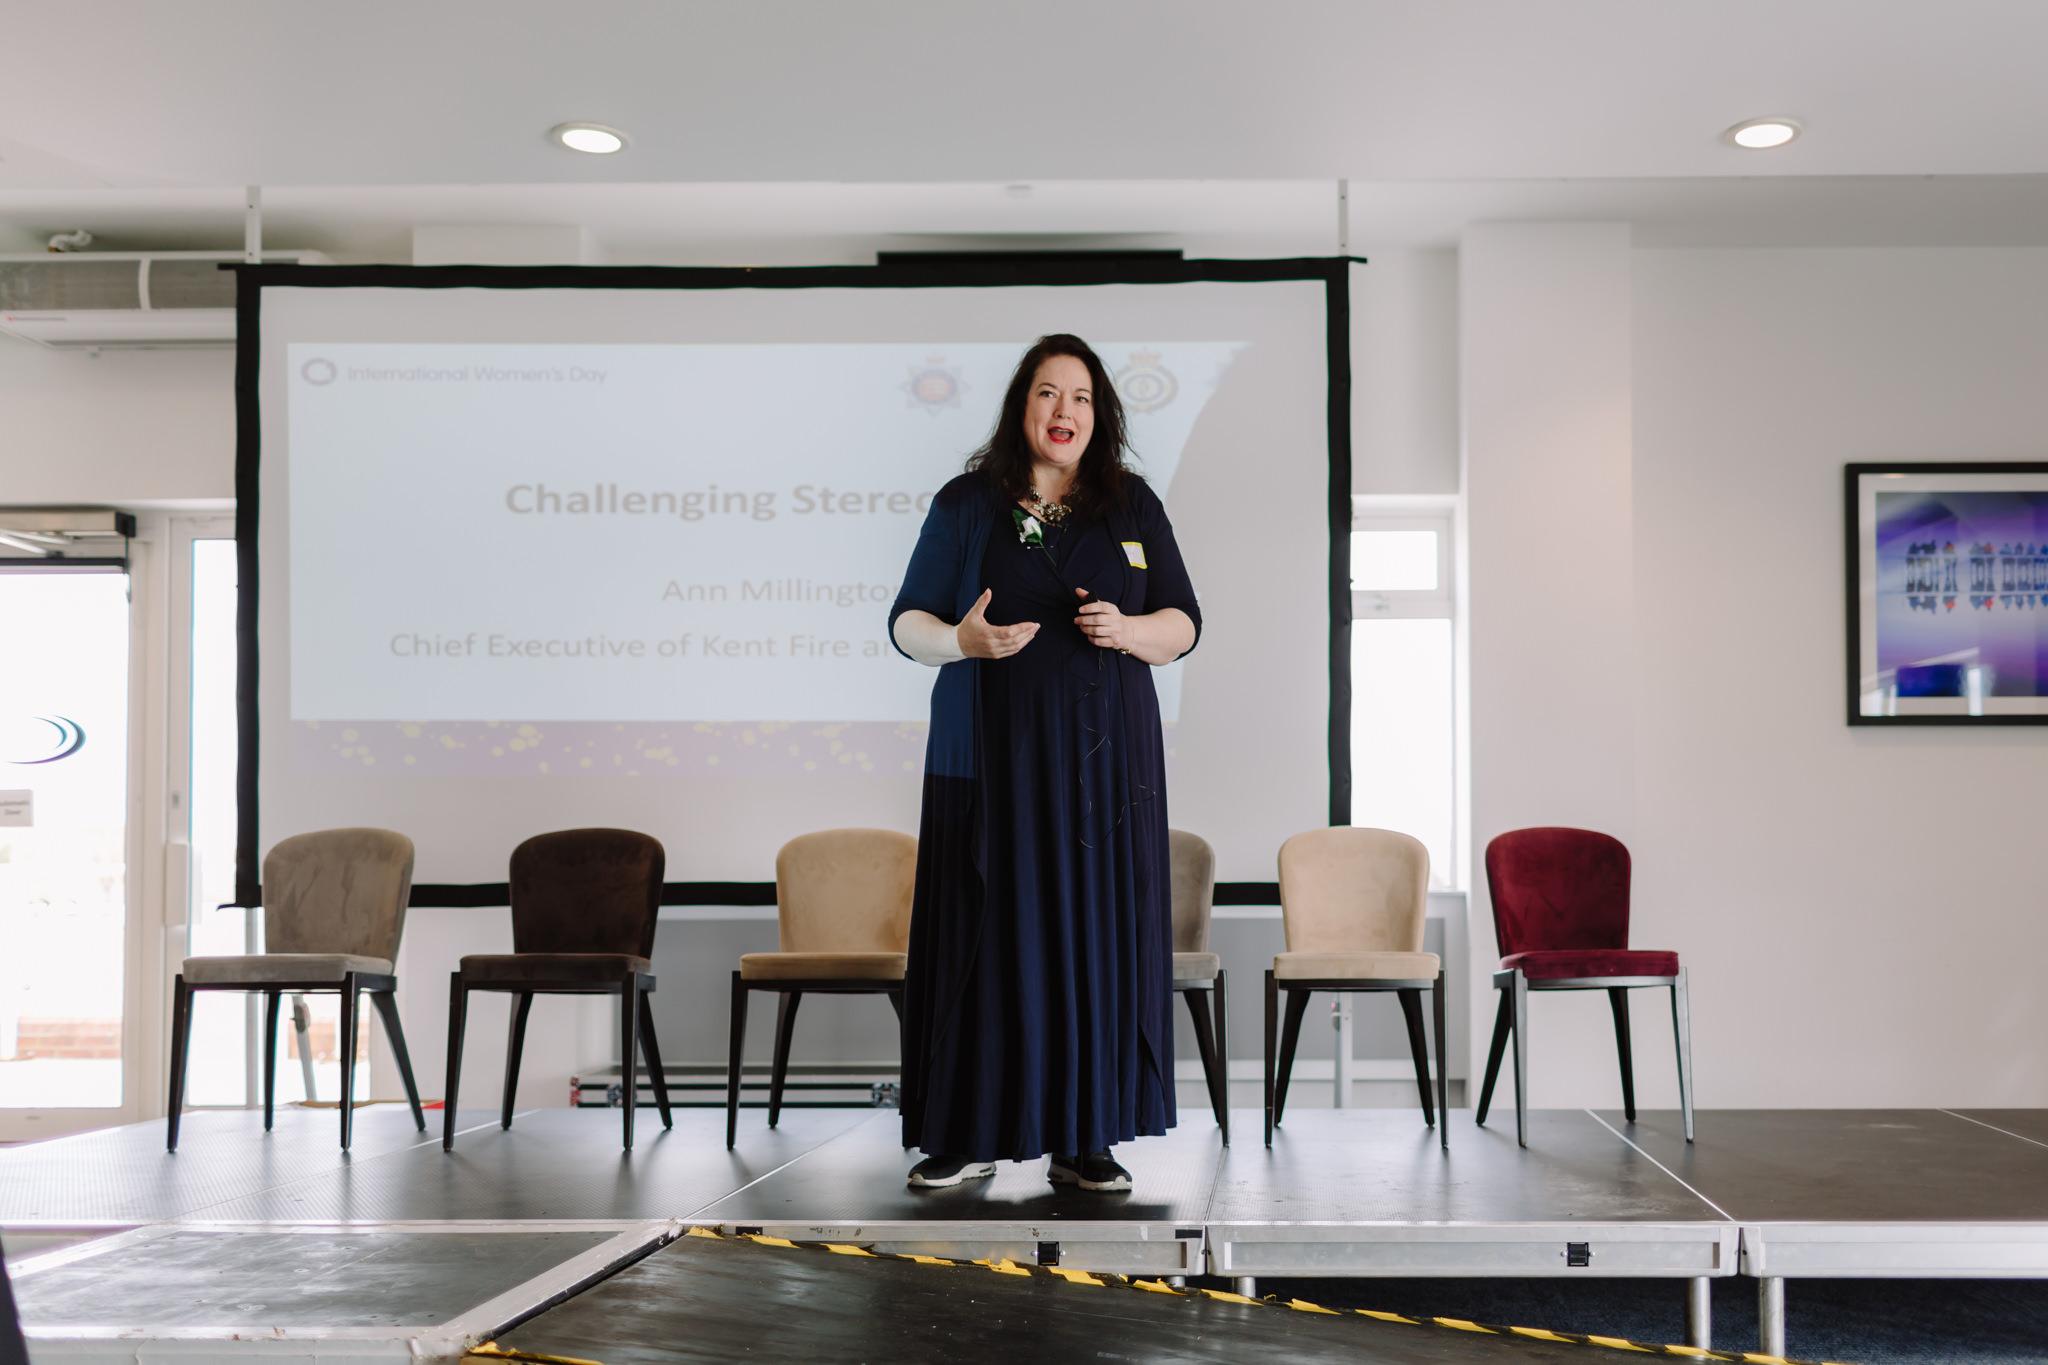 ann millington speaking at international women's day conference